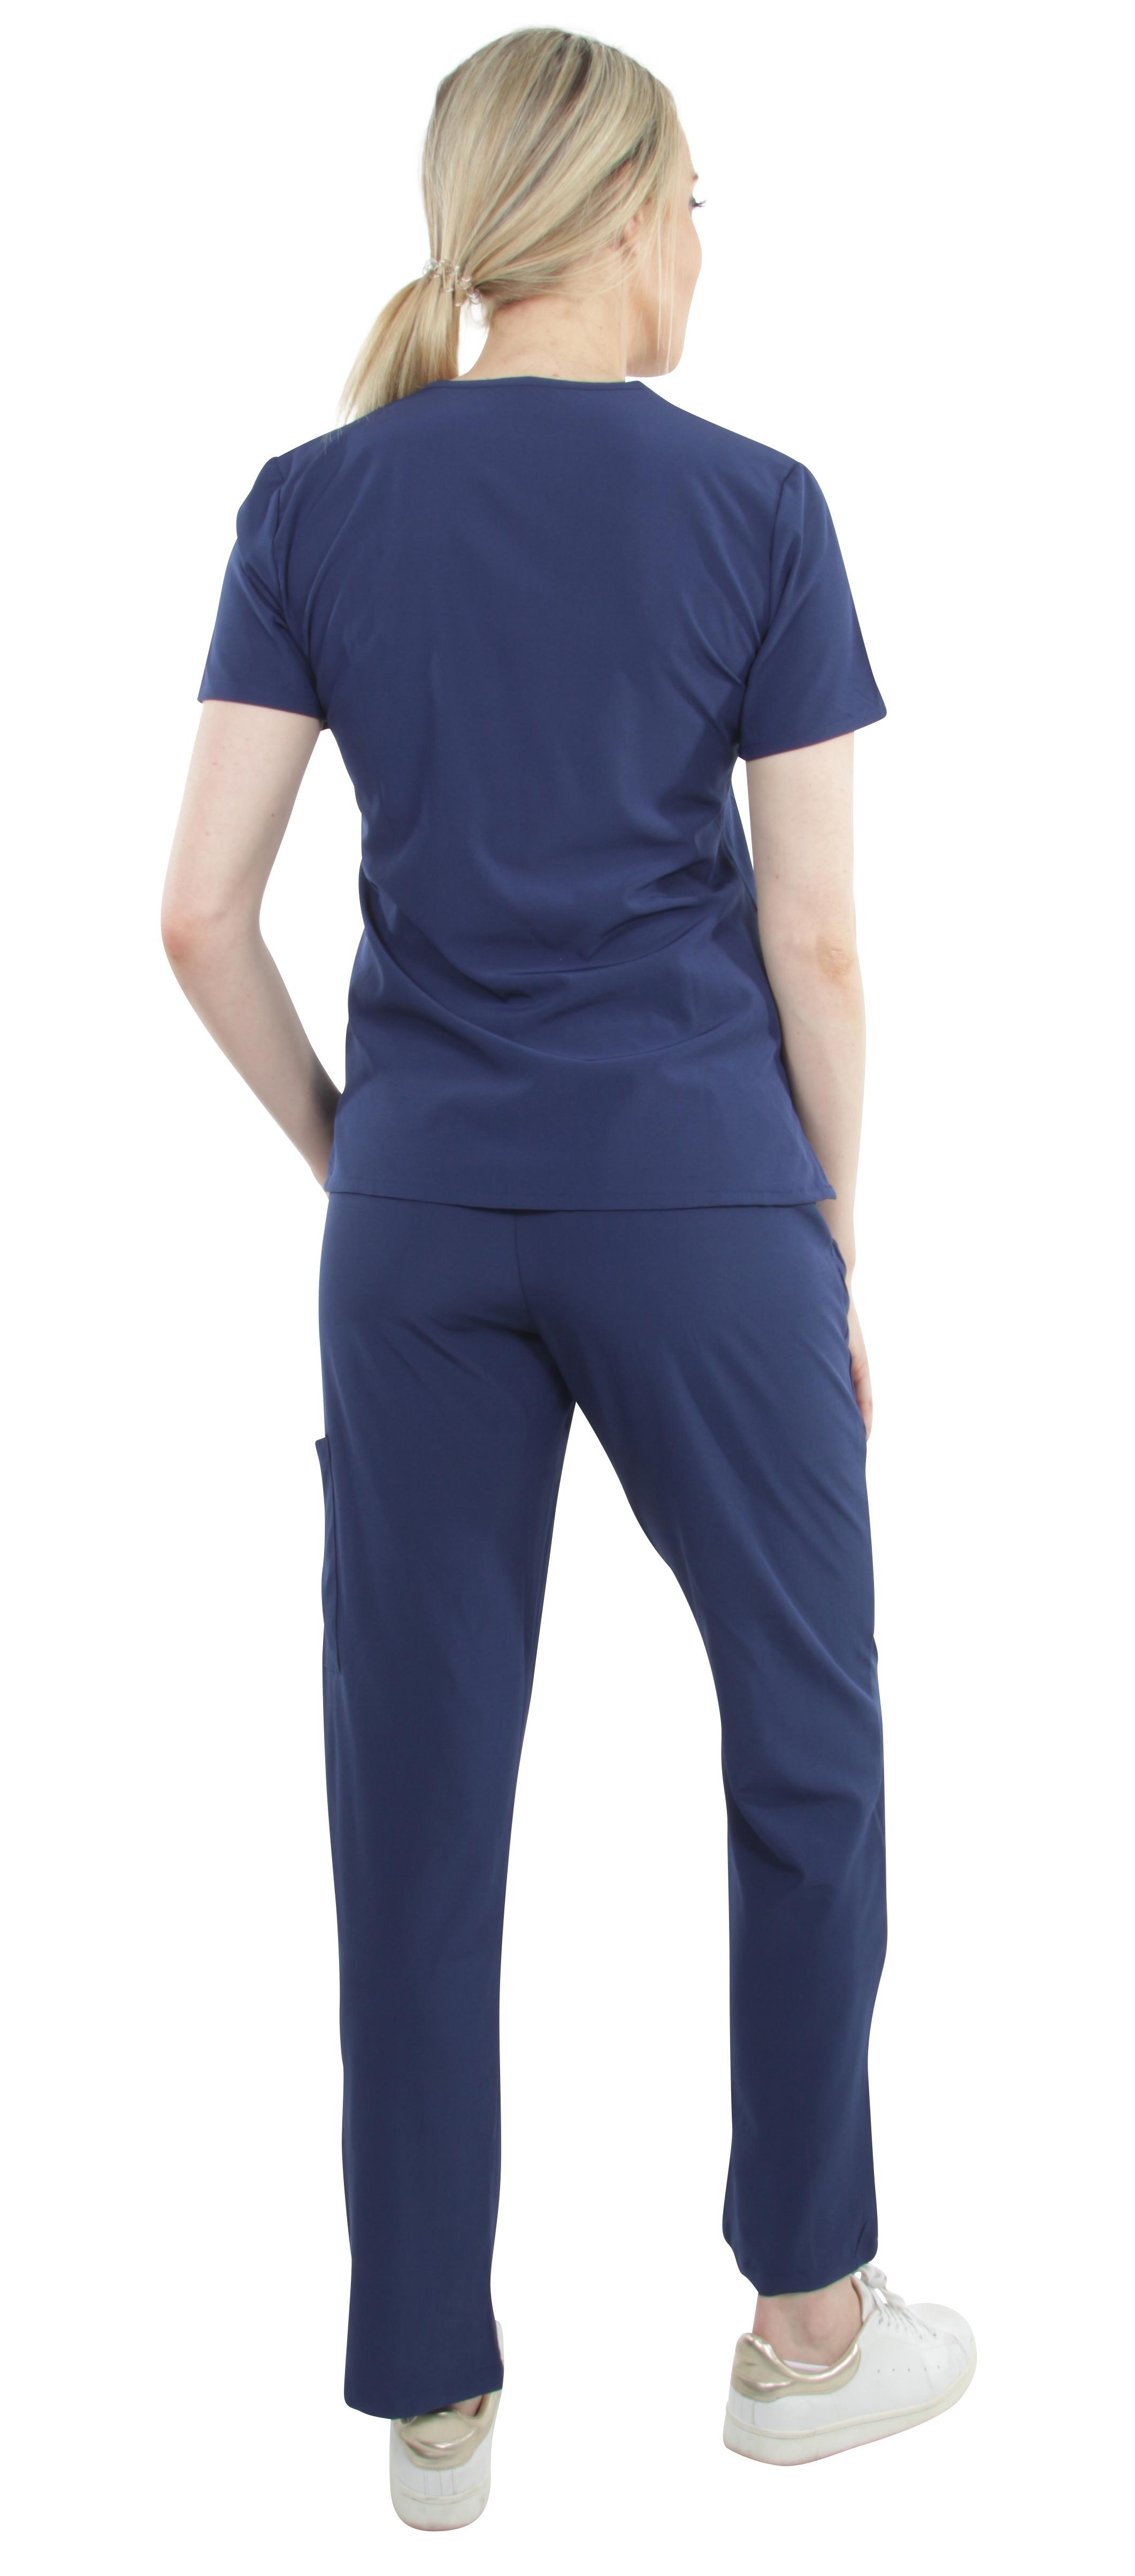 Unisex-Stretch-Medical-Uniform-Five-Pockets-V-Neck-Scrubs-Sets-with-Side-Panels thumbnail 34